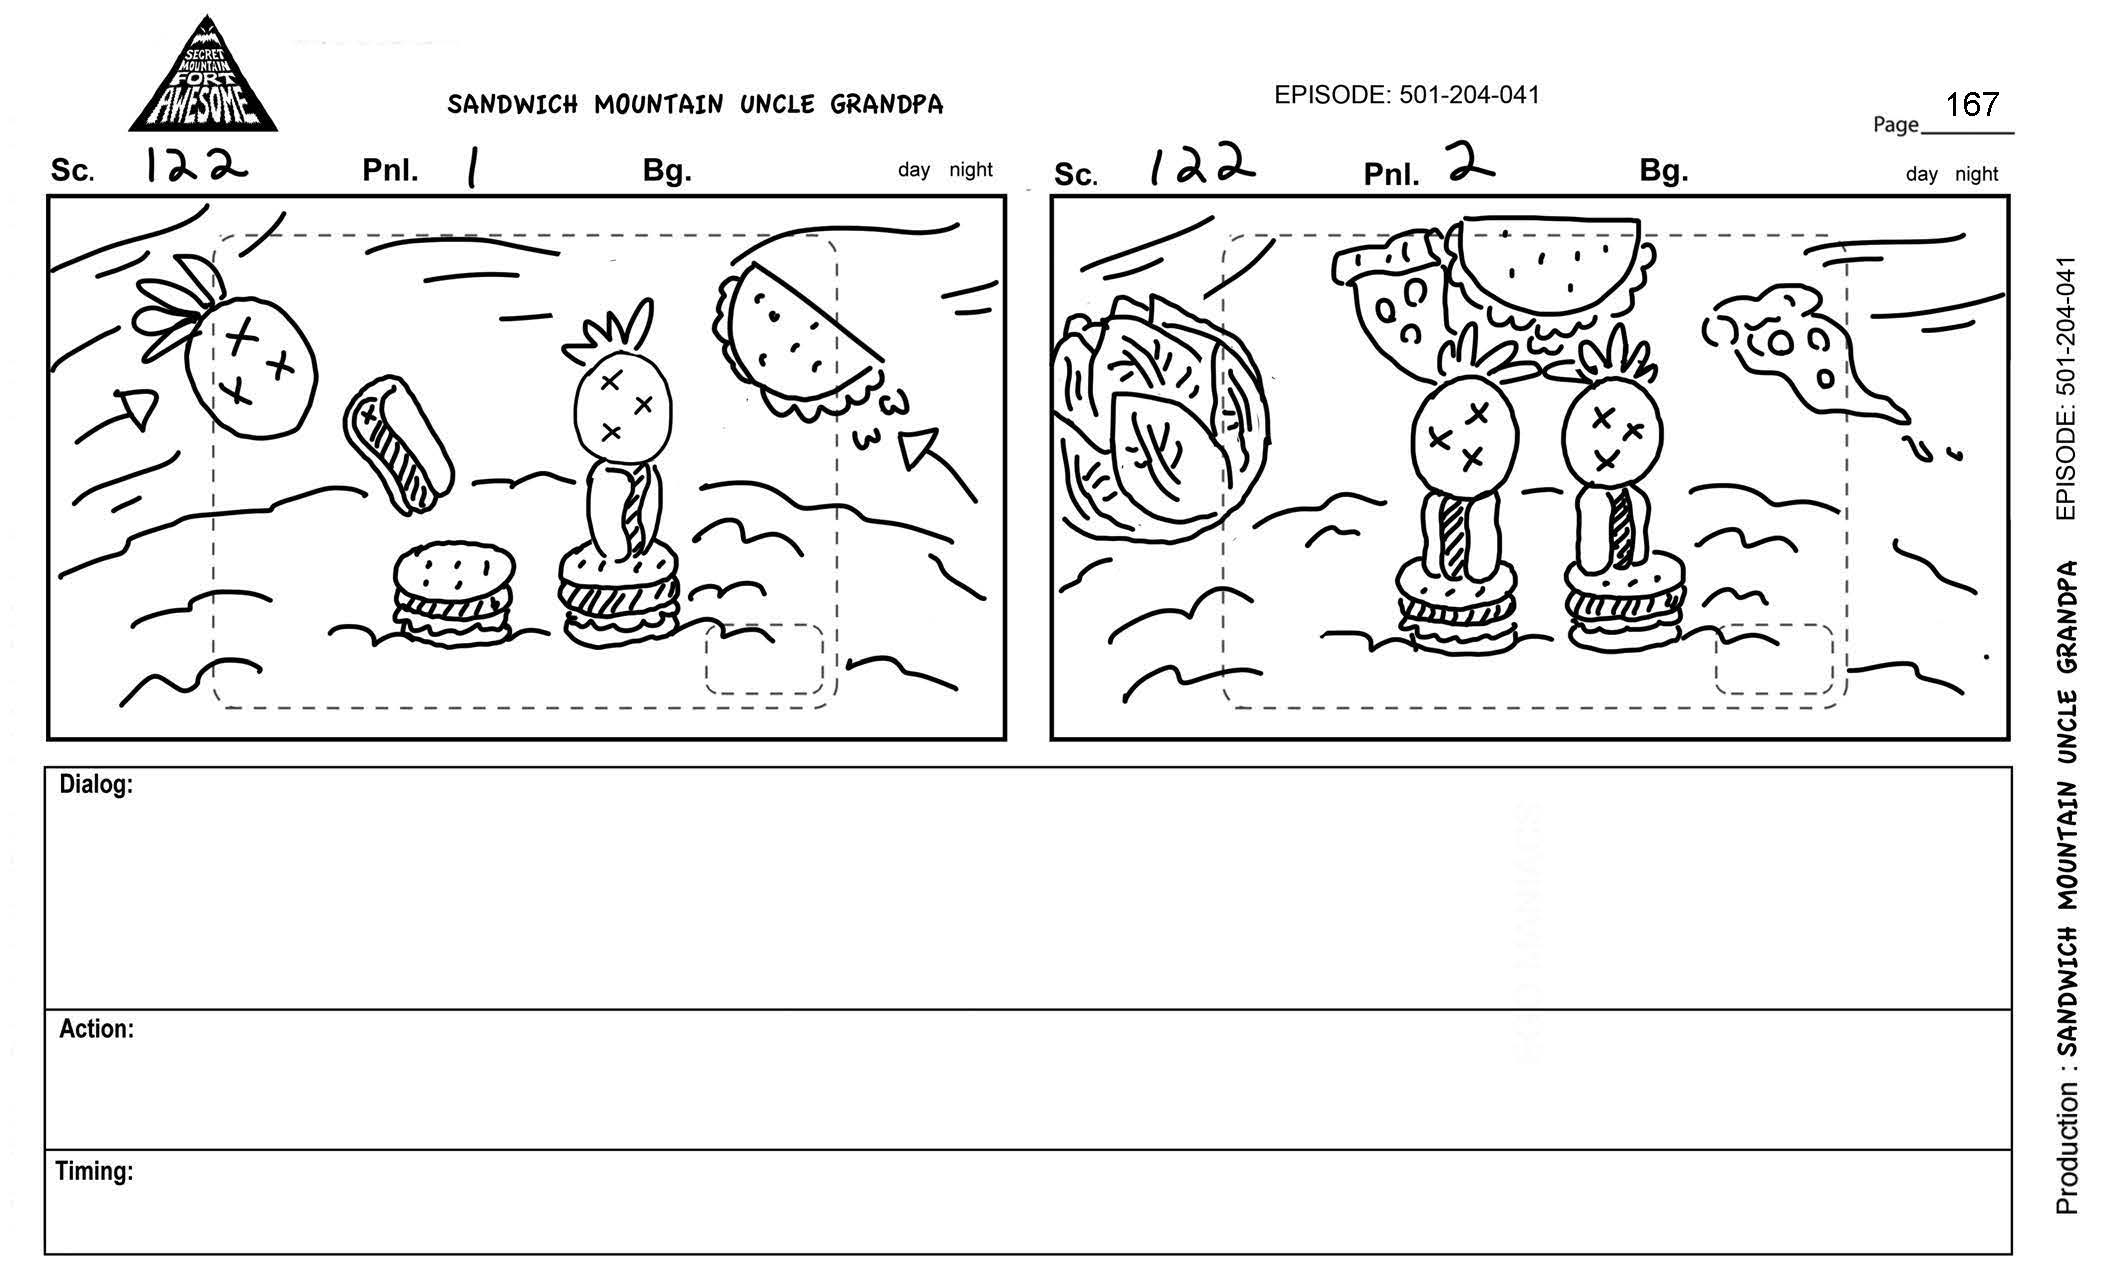 SMFA_SandwichMountainUncleGrandpa_Page_167.jpg